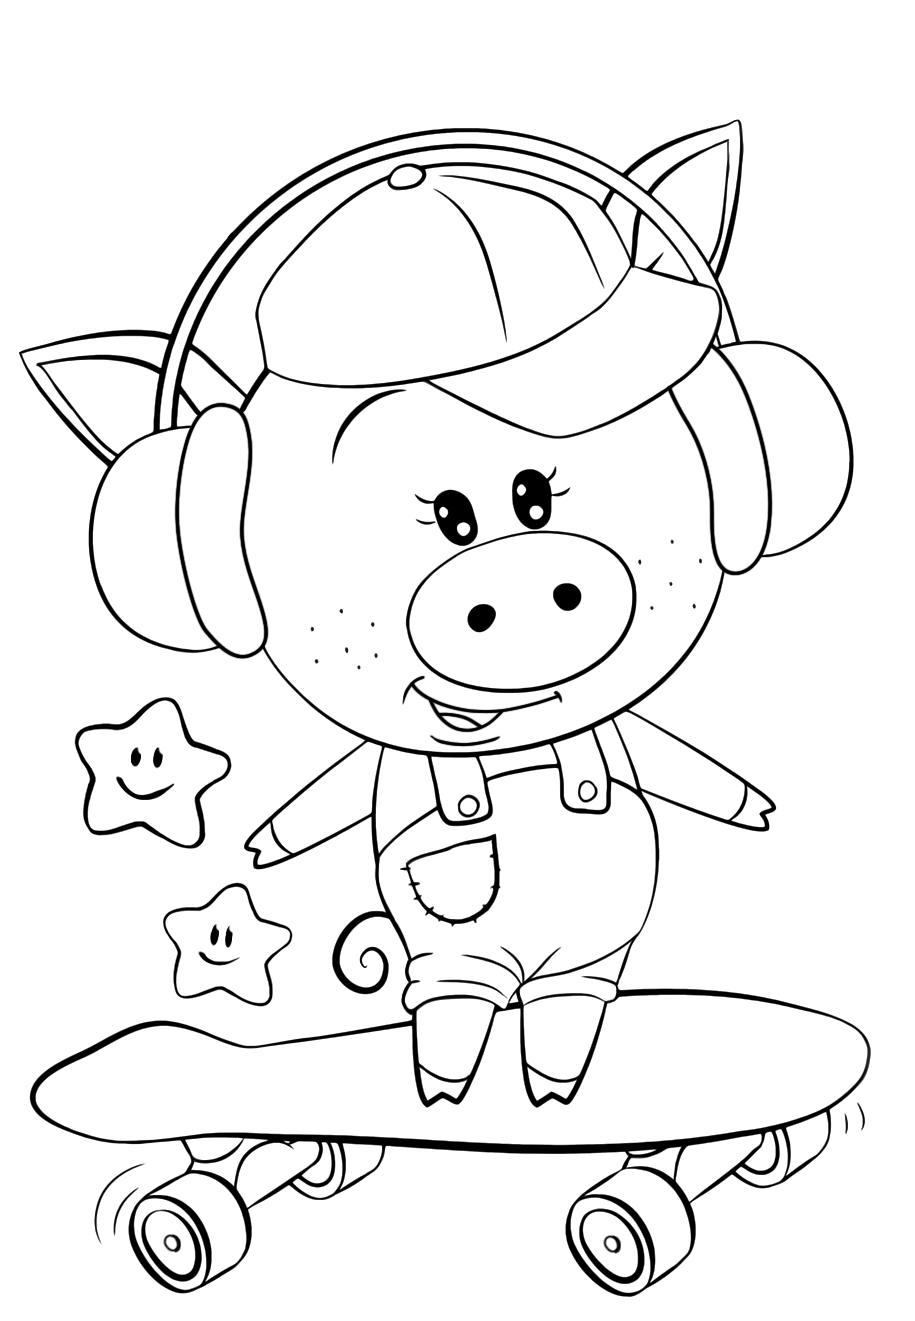 Pig on a skateboard